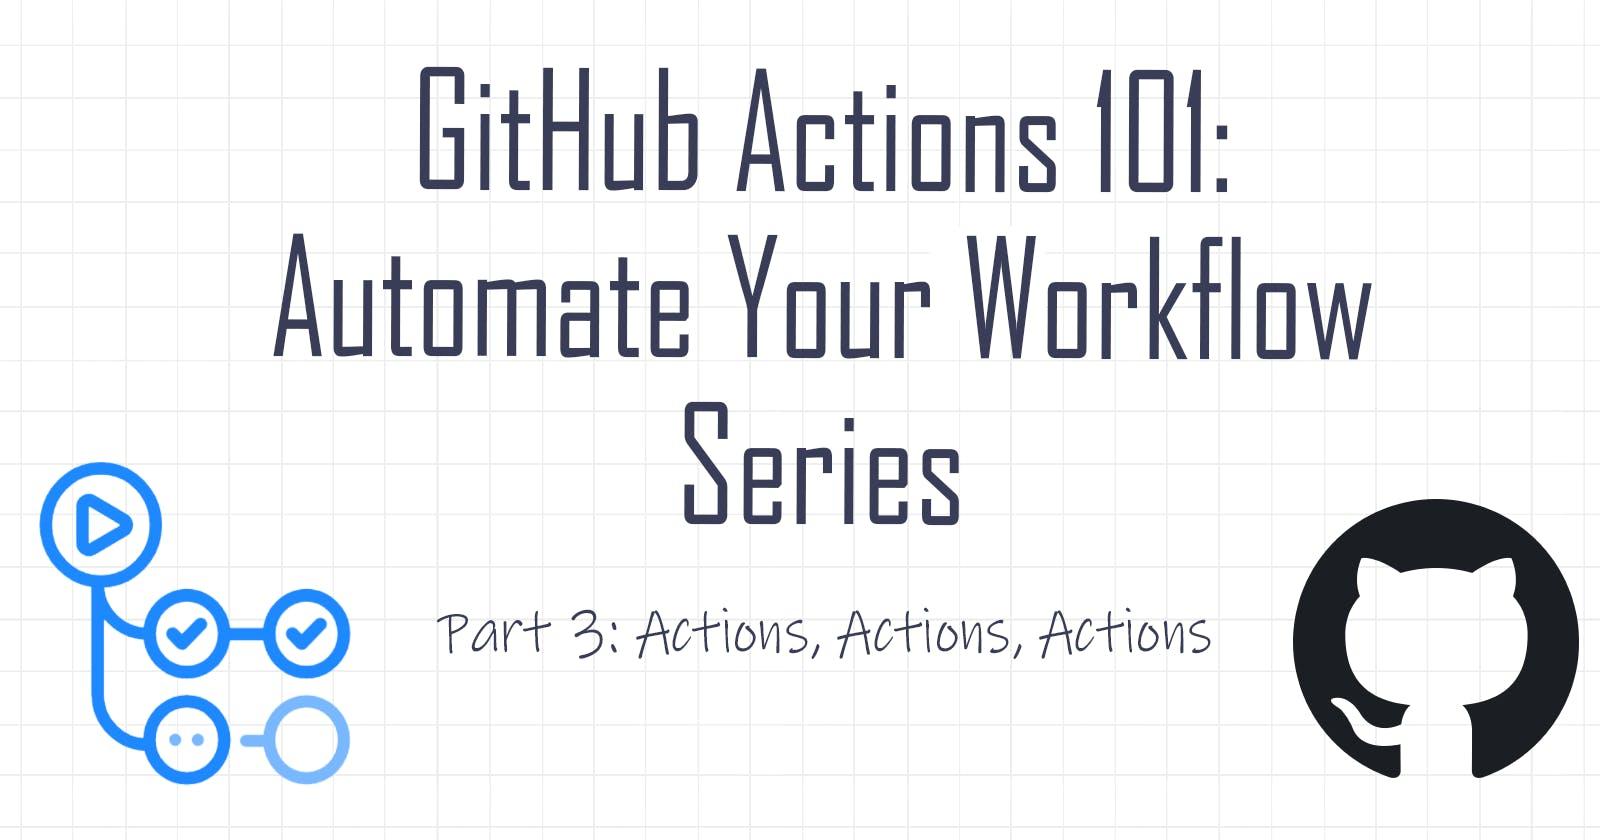 GitHub Actions 101: Actions, Actions, Actions